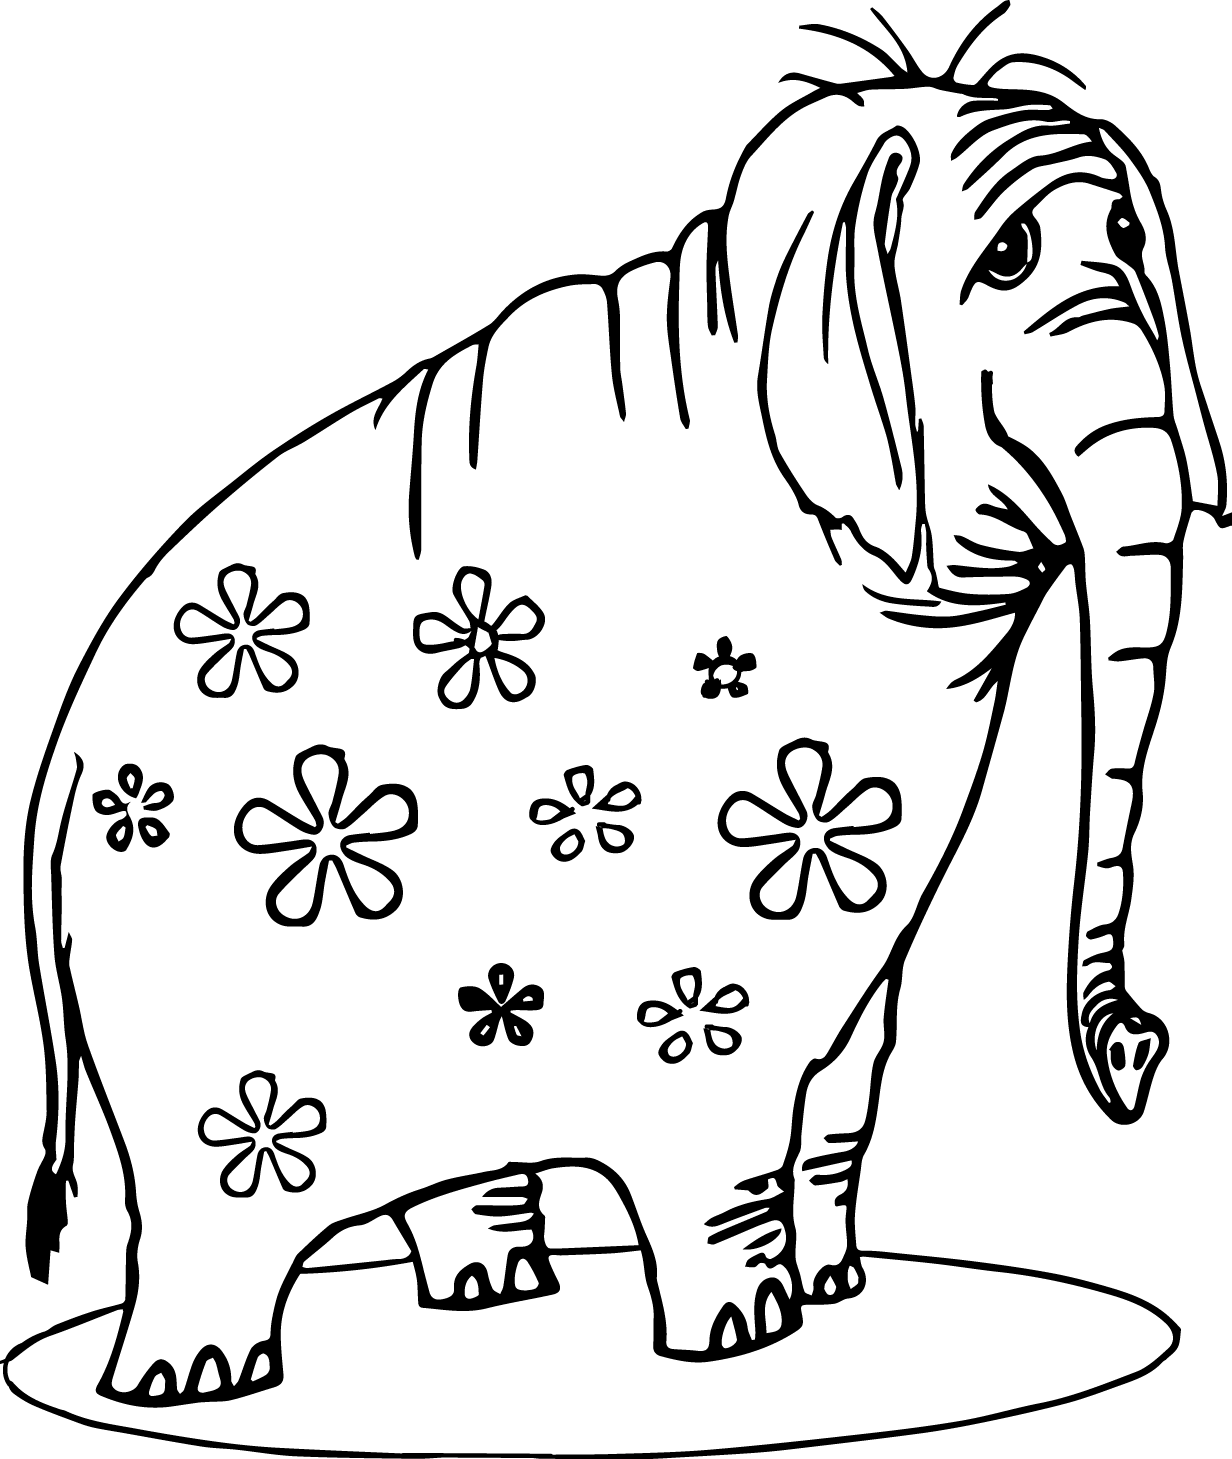 floral elephant coloring page floral elephant coloring pages for adults henna elephant coloring page elephant floral